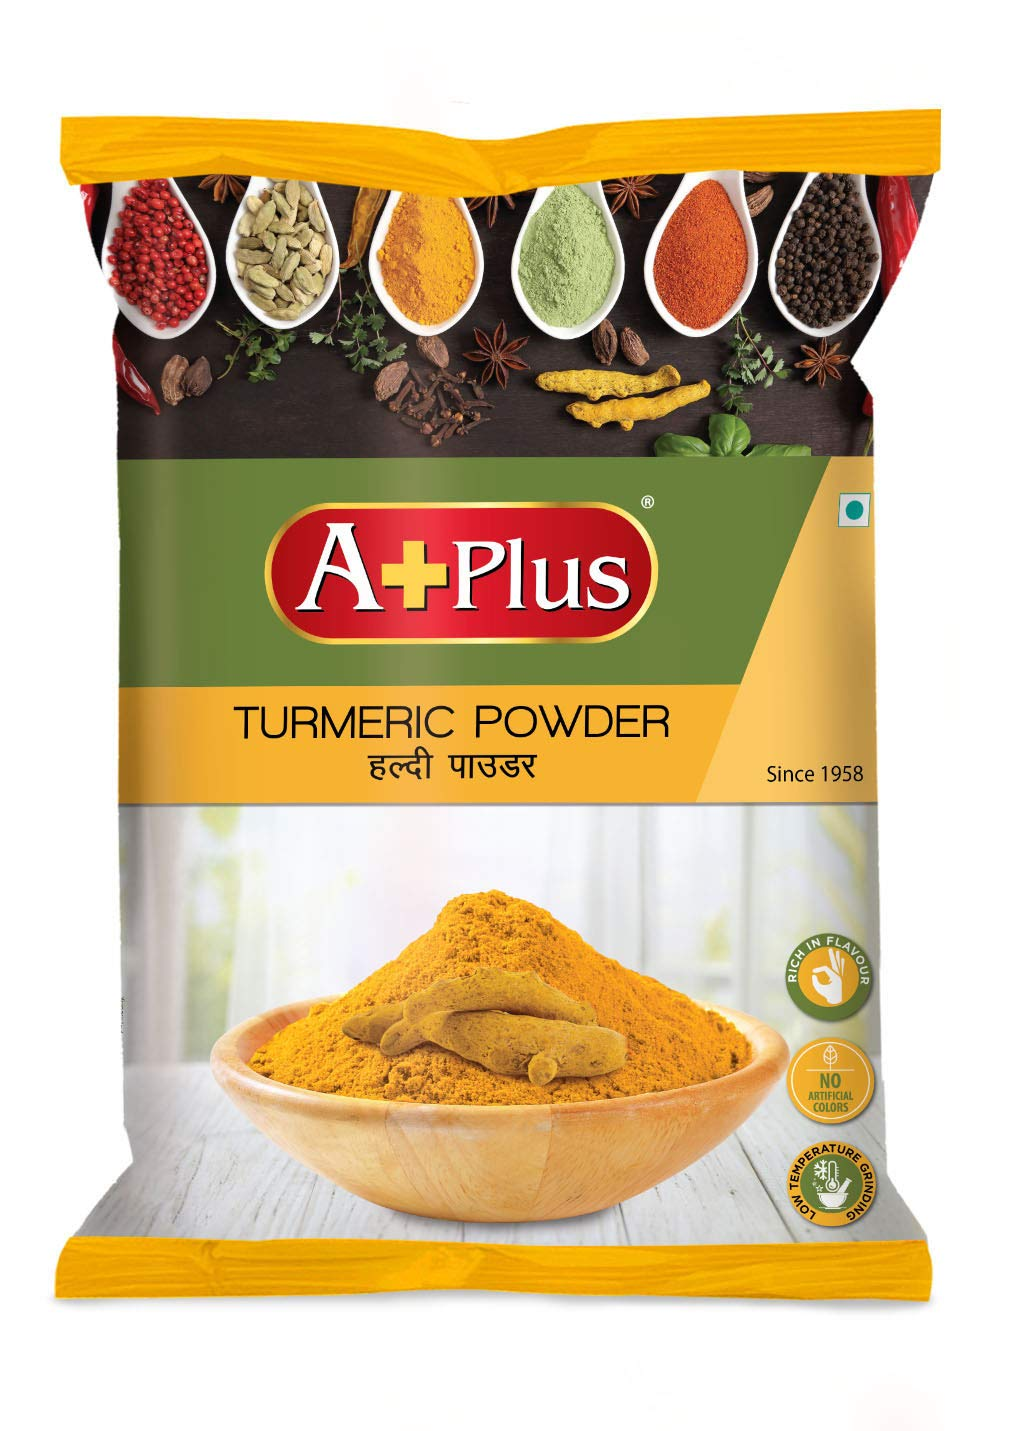 APLUS Turmeric Powder Pouch 2 x 500 g(1Kg)